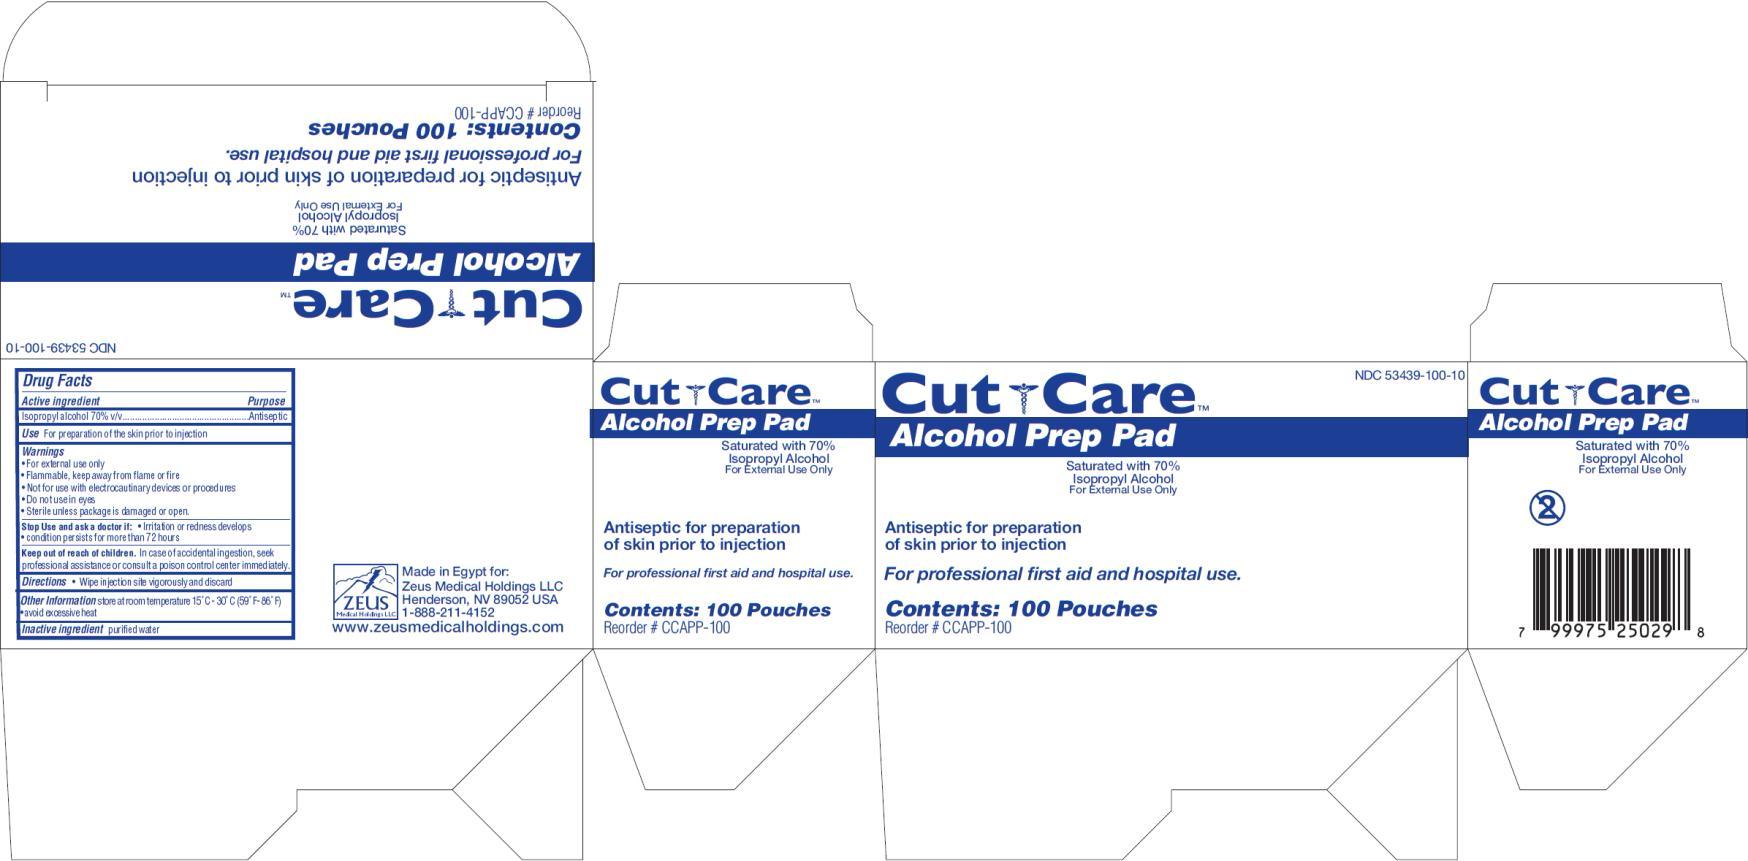 Cut Care Alcohol Prep Pad (Isopropyl Alcohol) Swab [Zeus Medical Holdings Llc]